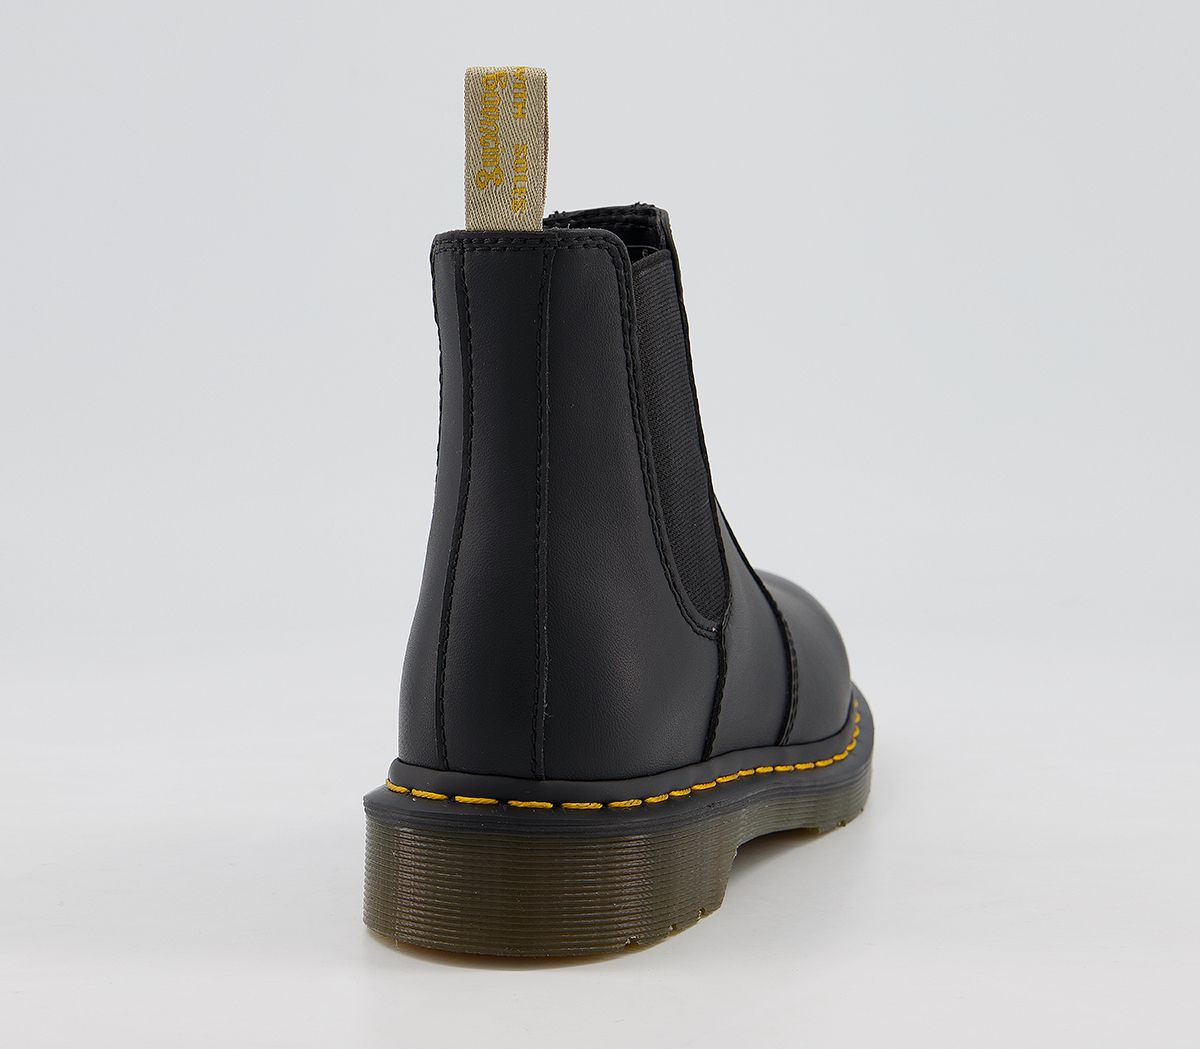 f62cc69bbca Dr. Martens Vegan 2976 Chelsea Boots Black - Ankle Boots